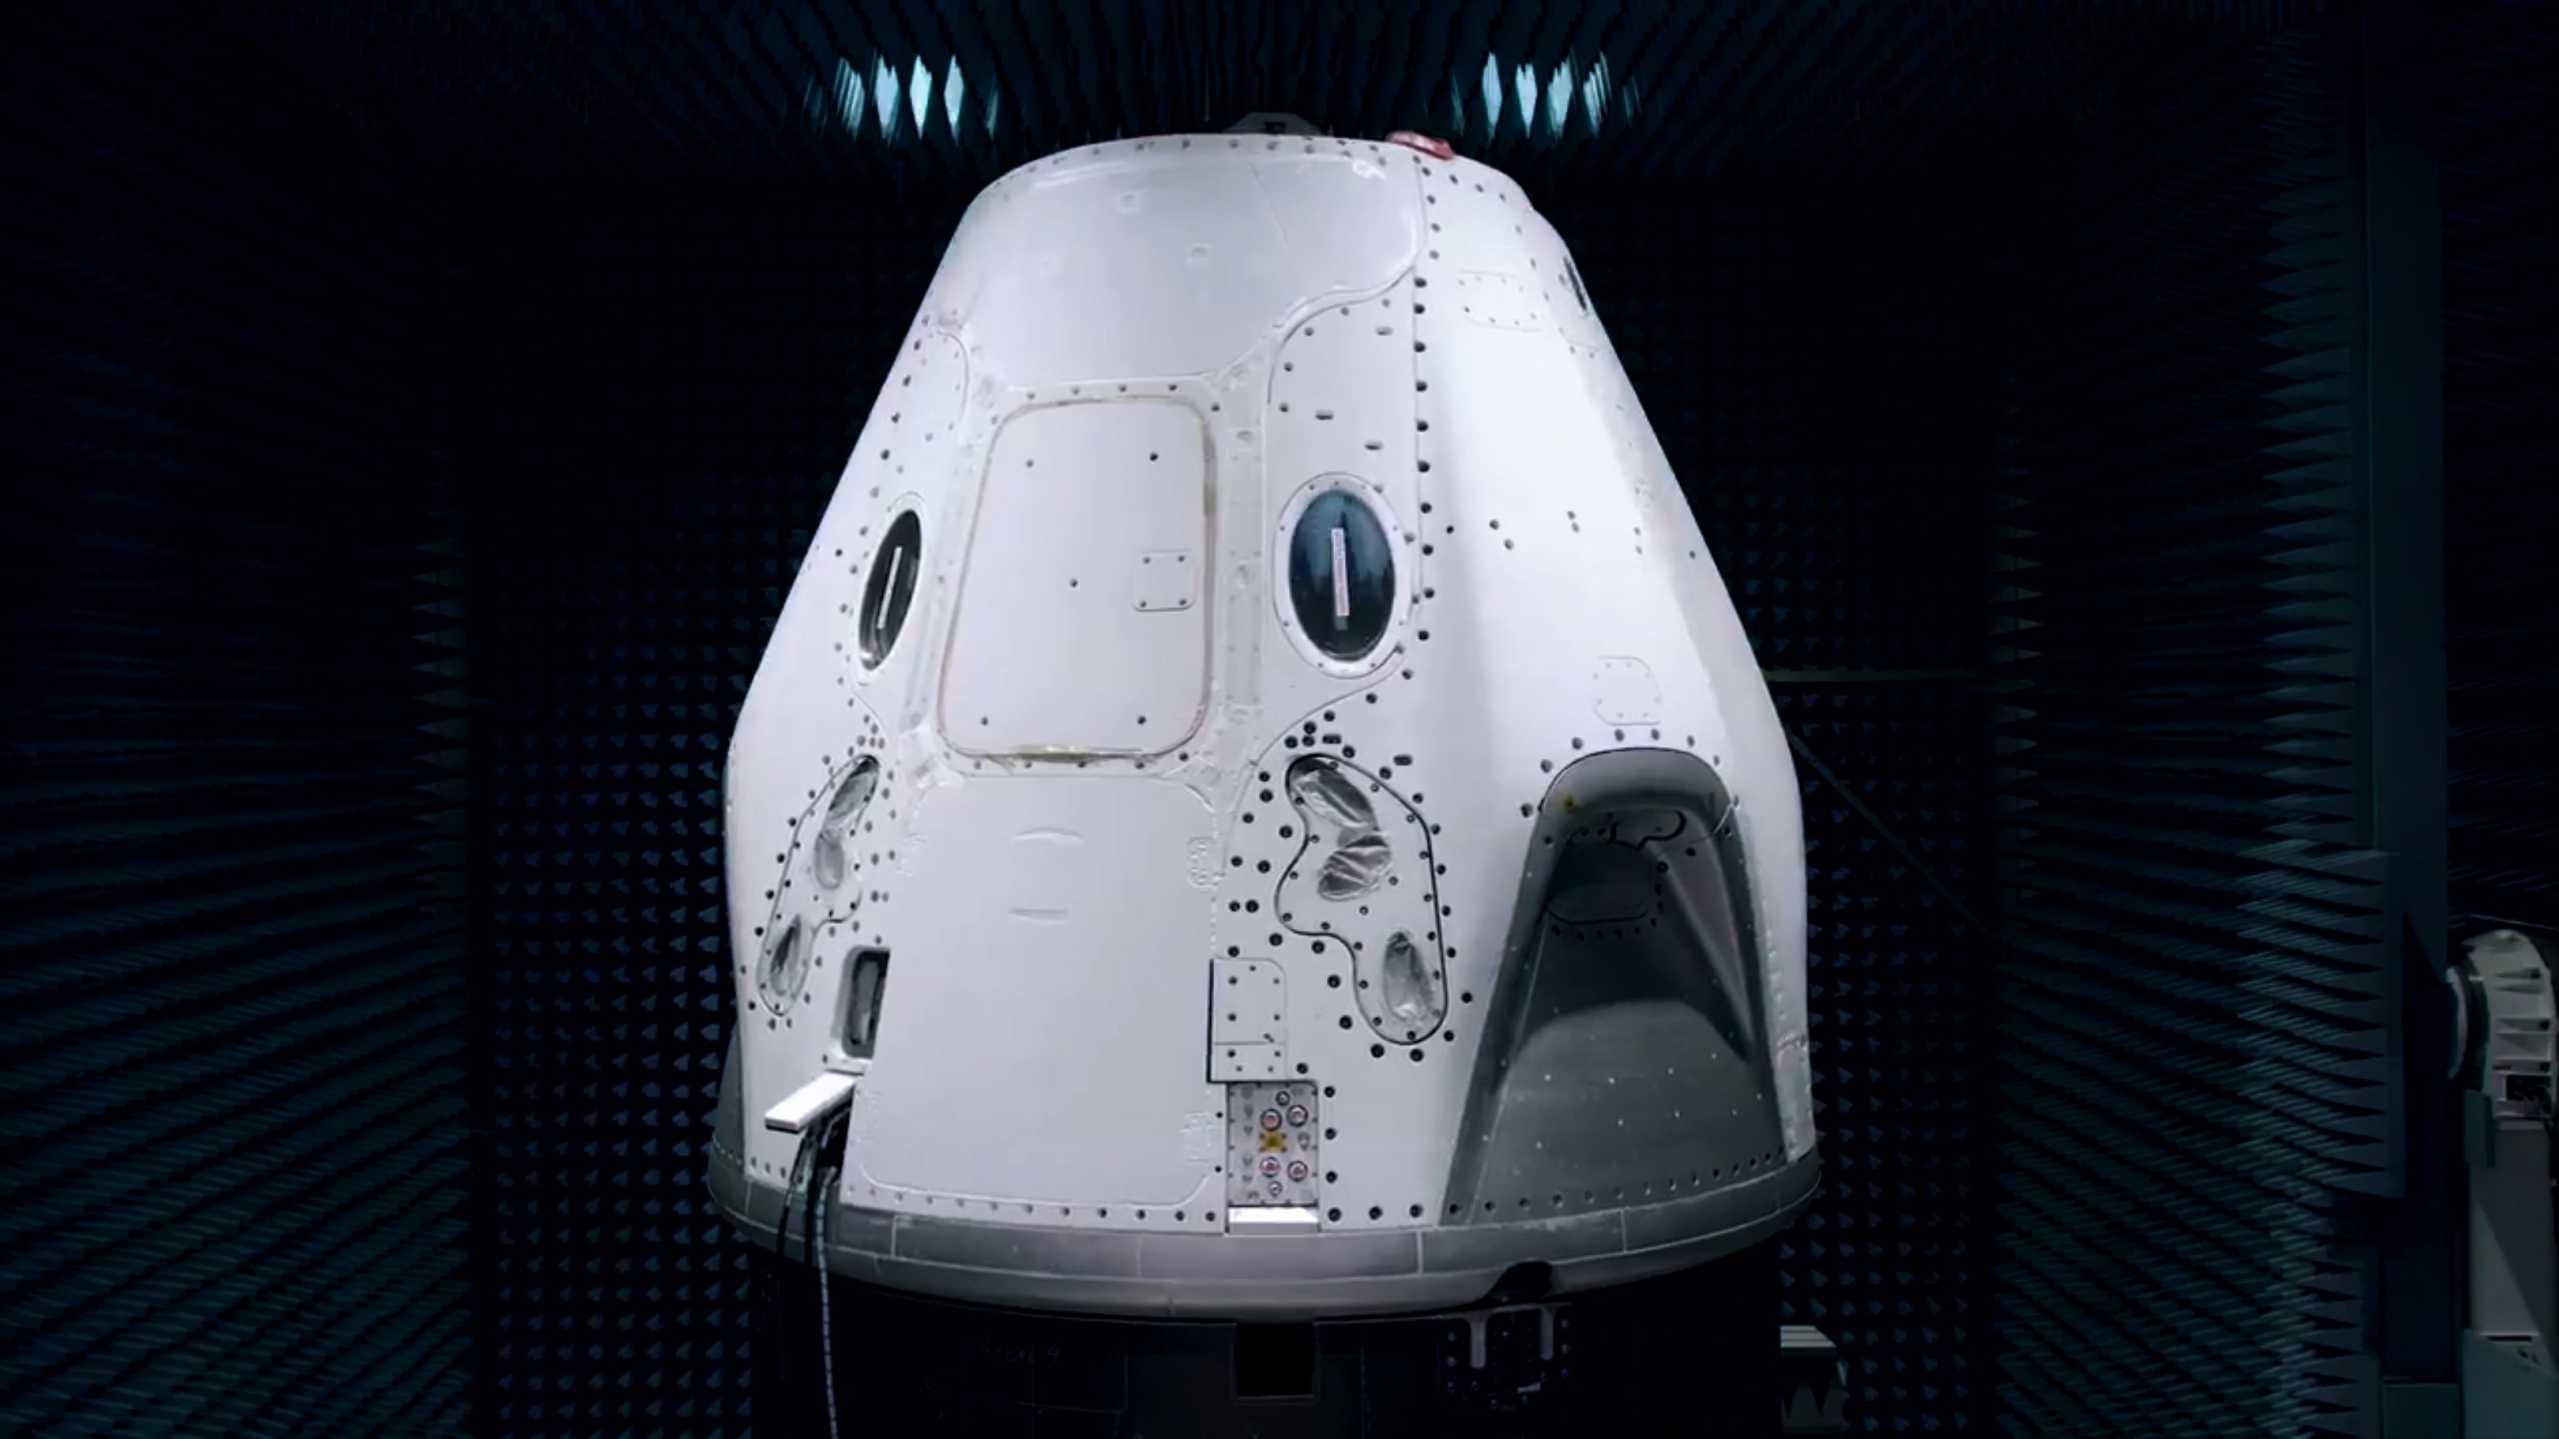 Crew Dragon C206 EMI test Feb 2020 (SpaceX) 9 (c)